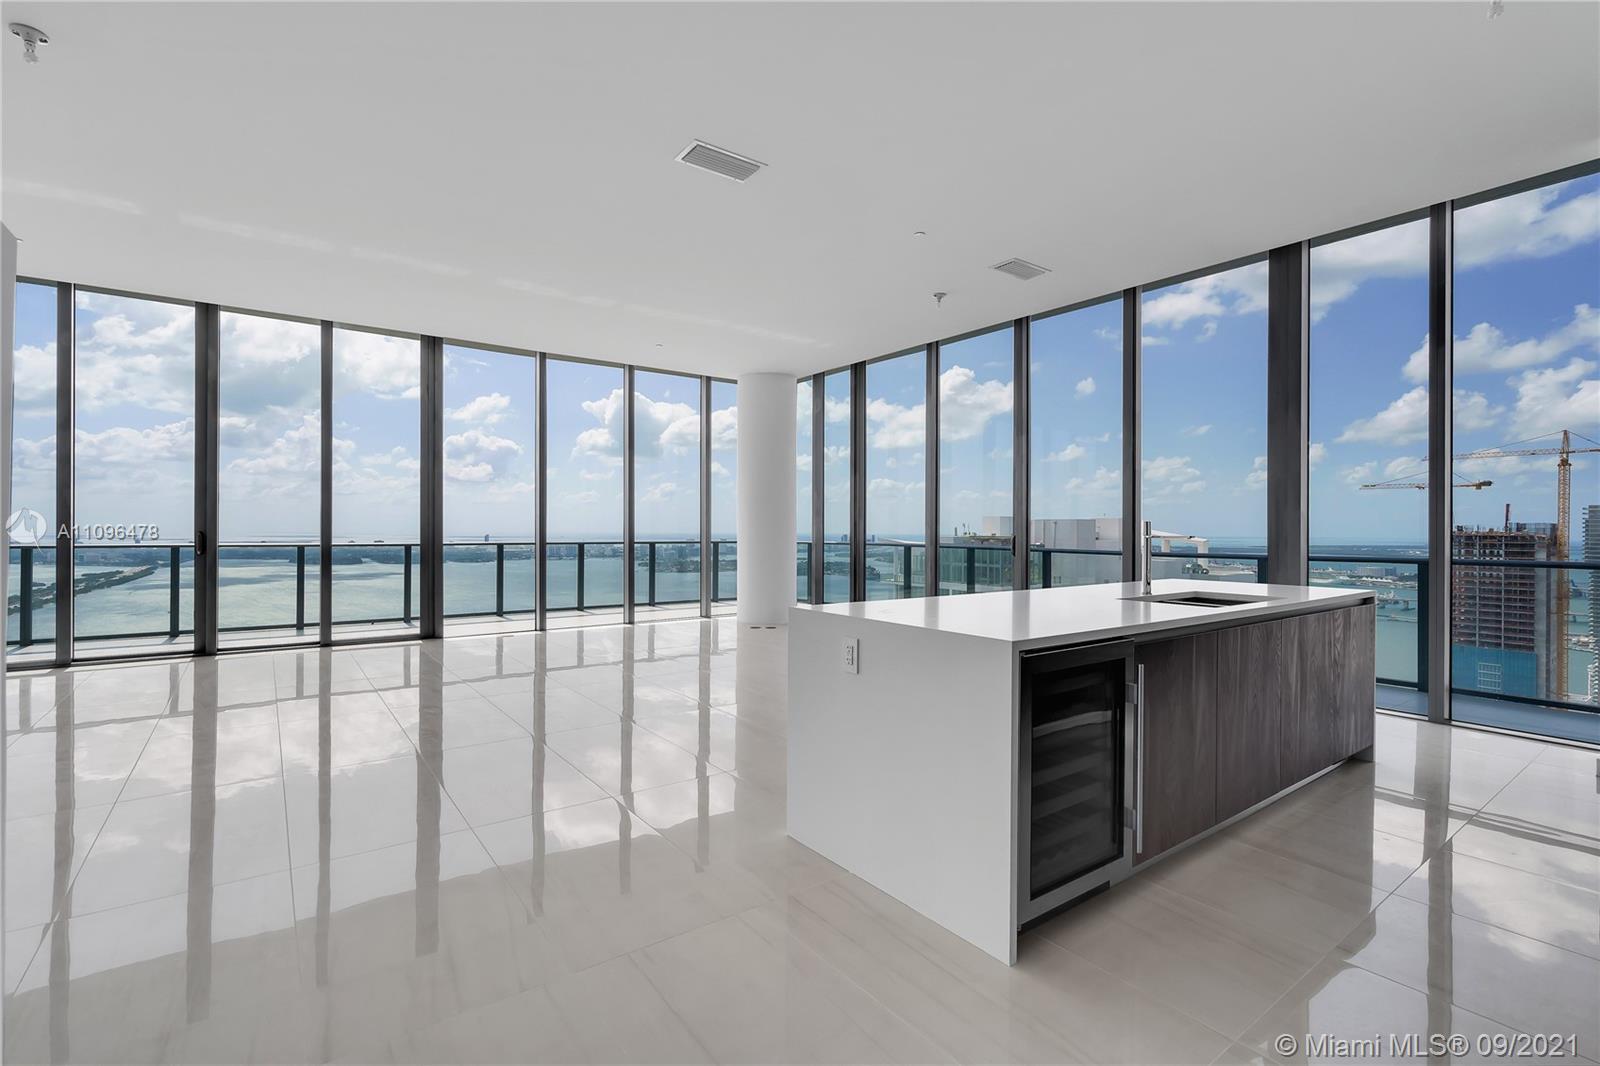 480 NE 31st St, Unit #PH5401 Luxury Real Estate